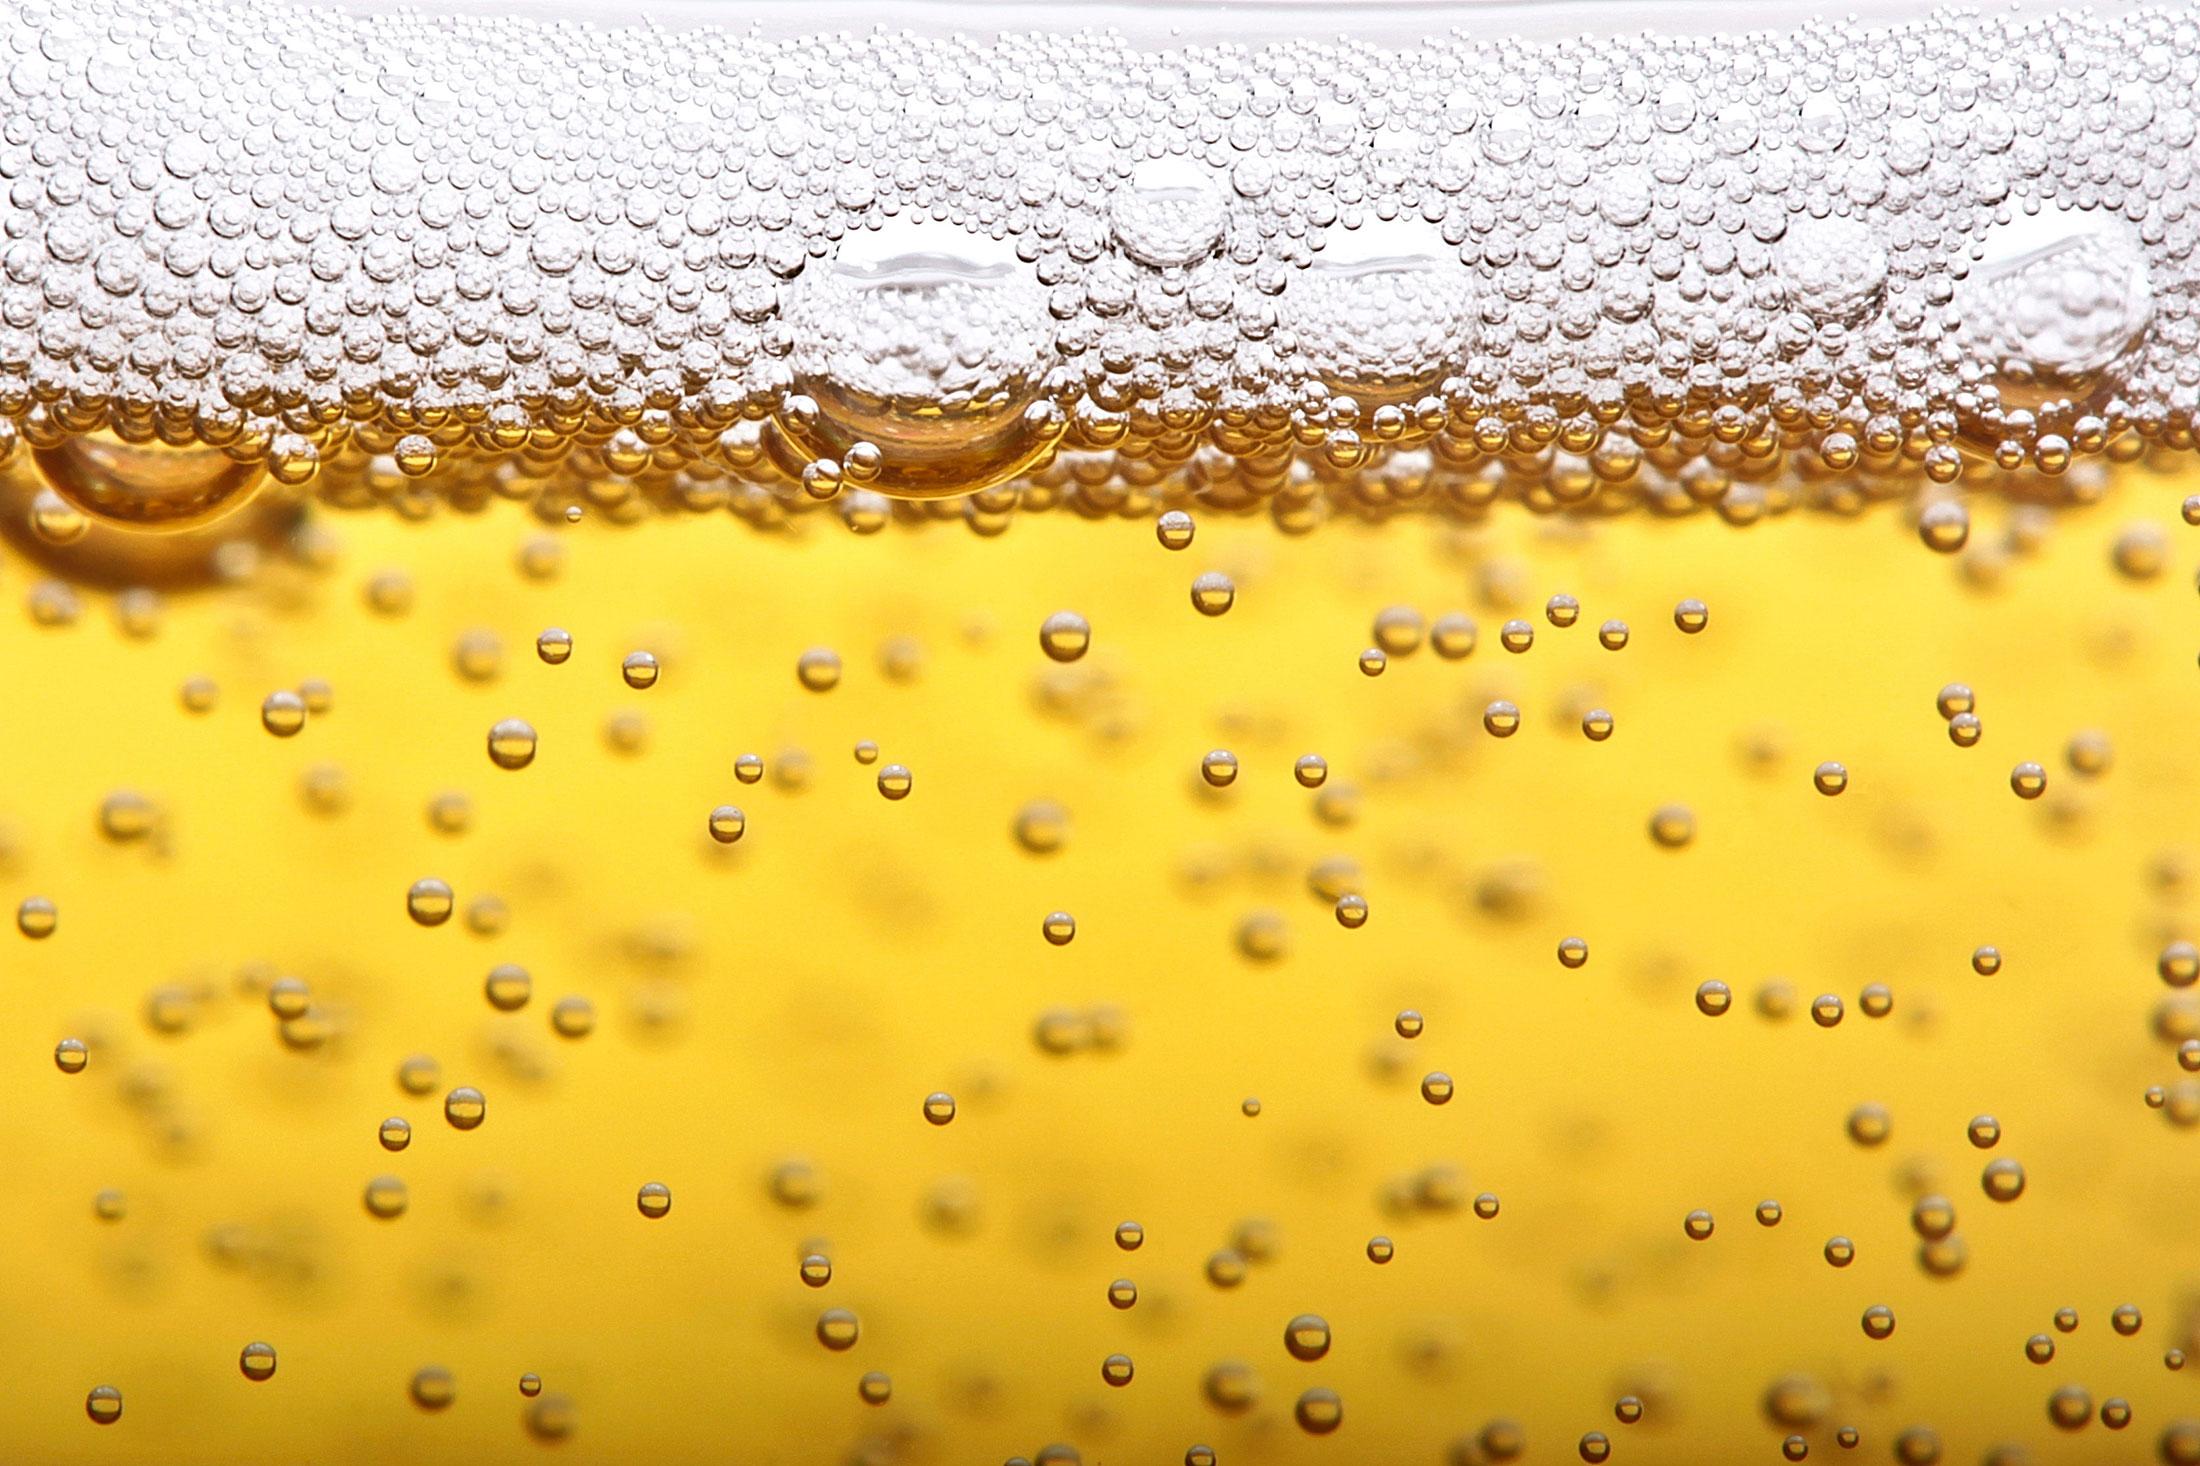 bloomberg.com - Michael Msika - Binging on Beer & Whisky: Taking Stock